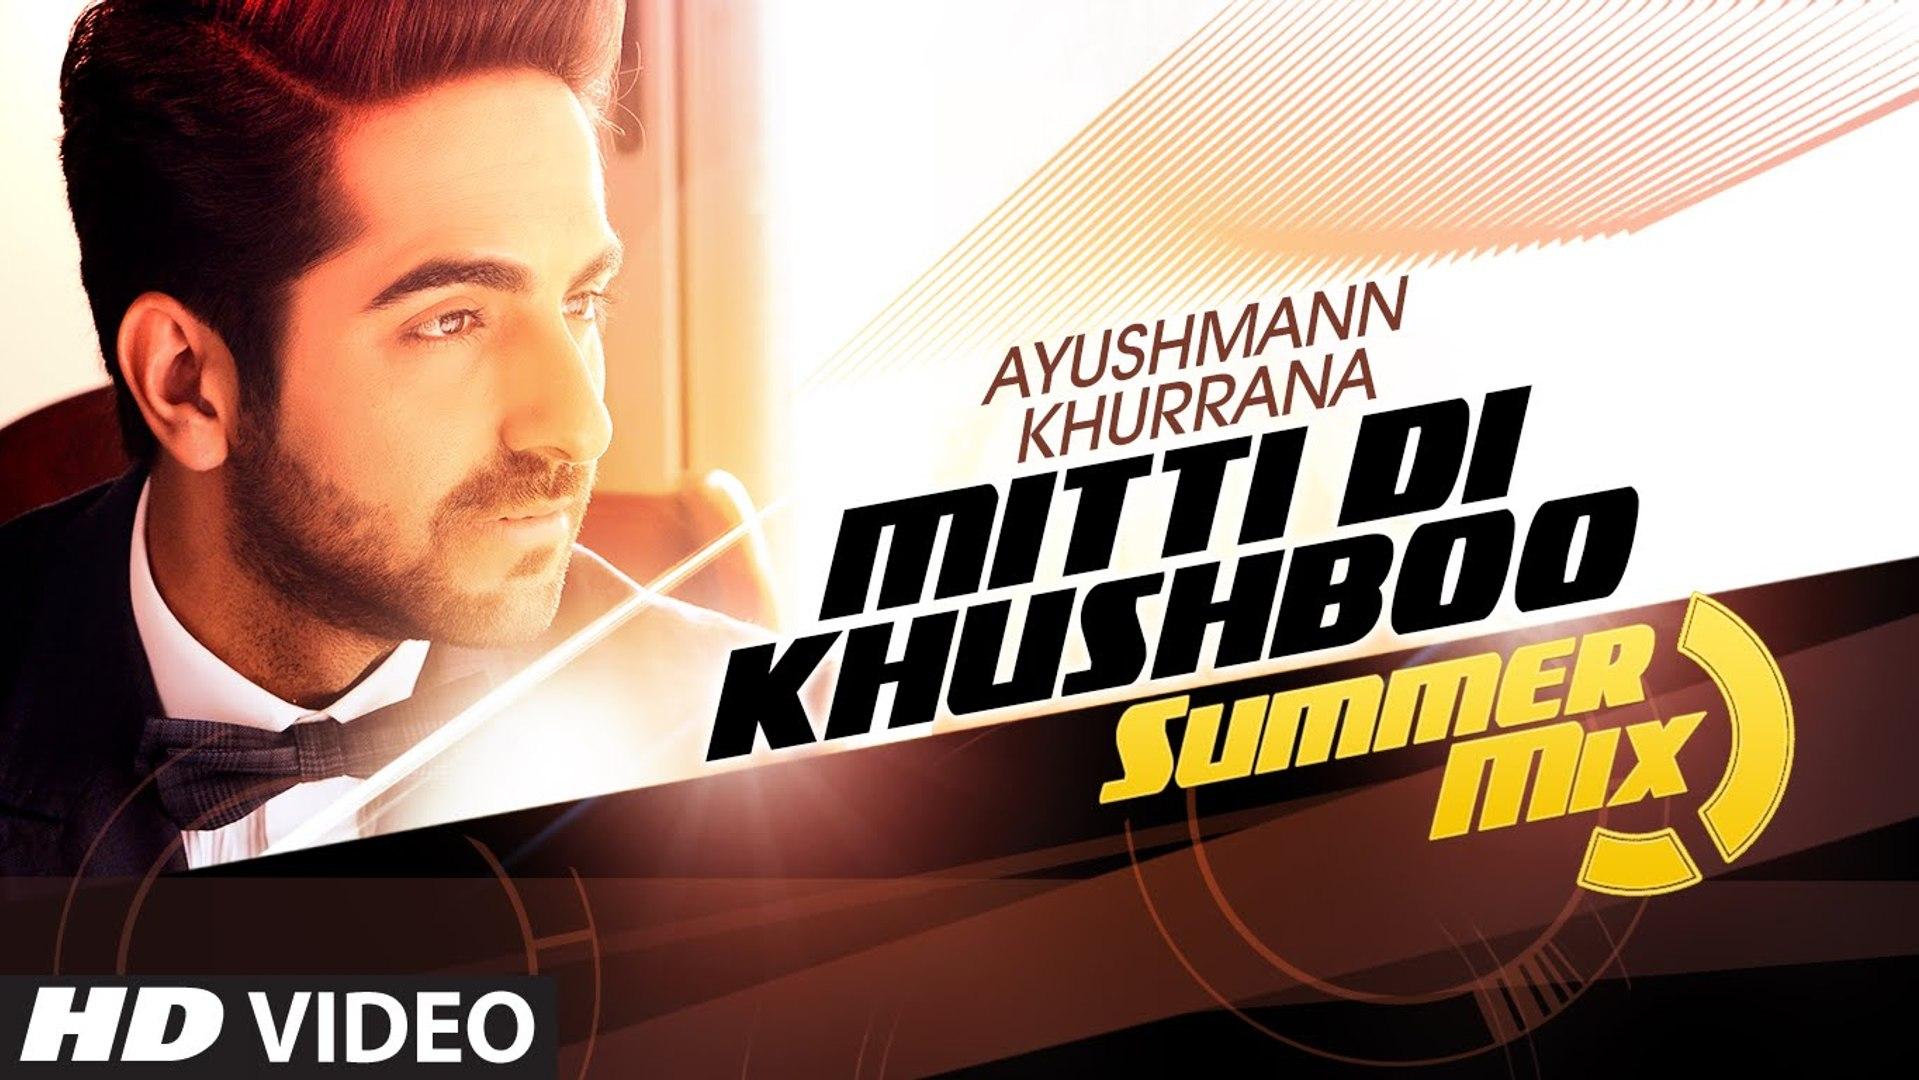 Mitti Di Khushboo (Summer Mix) VIDEO Song Ayushmann Khurrana